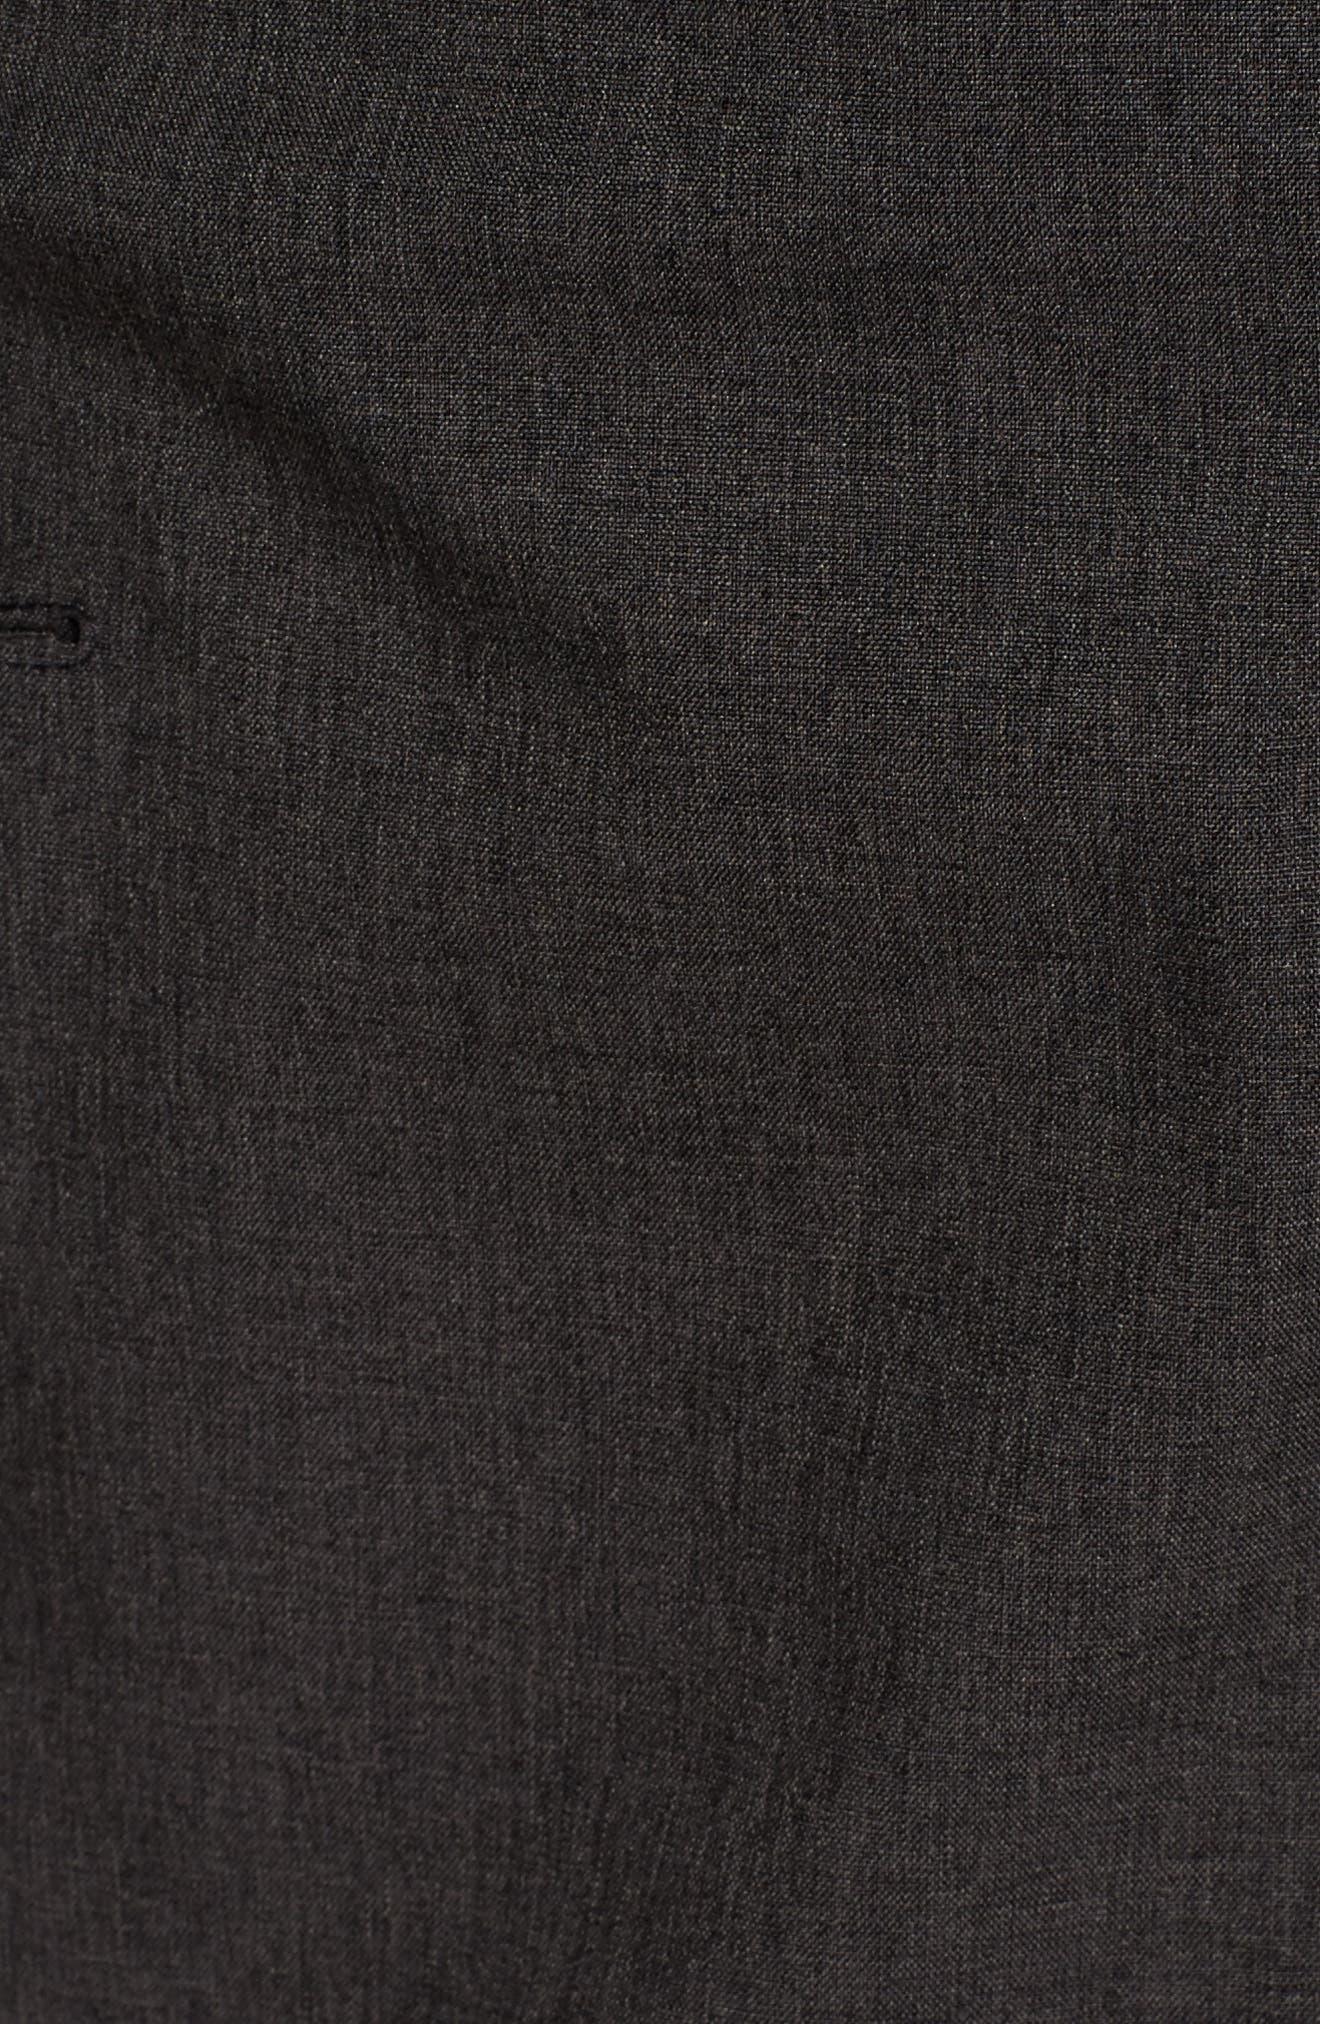 'Kilowatt' Hooded Jacket,                             Alternate thumbnail 6, color,                             001